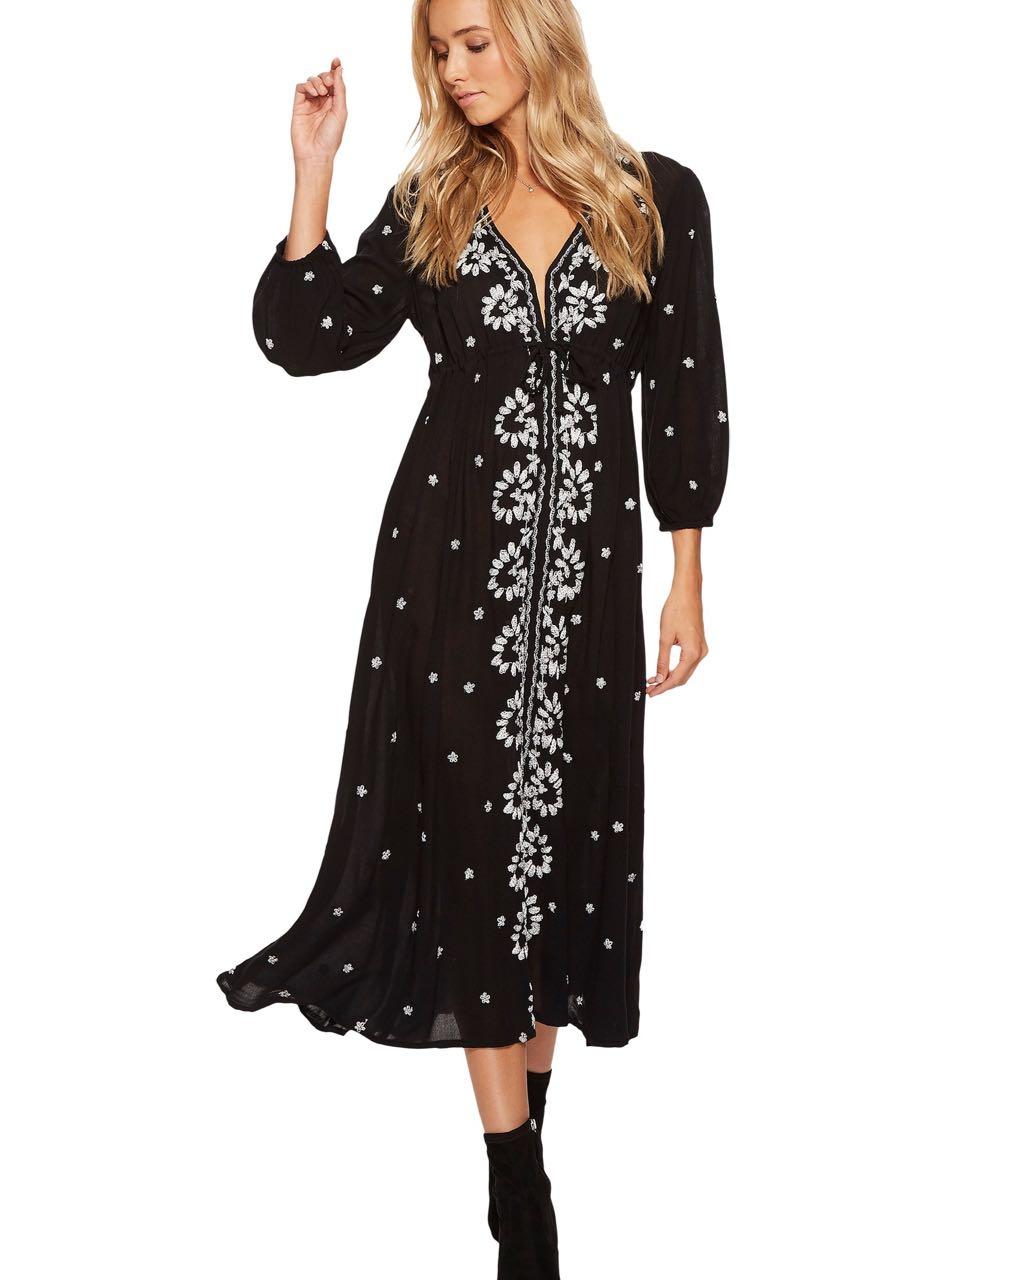 Free people embroidered v maxi dress ob canada us